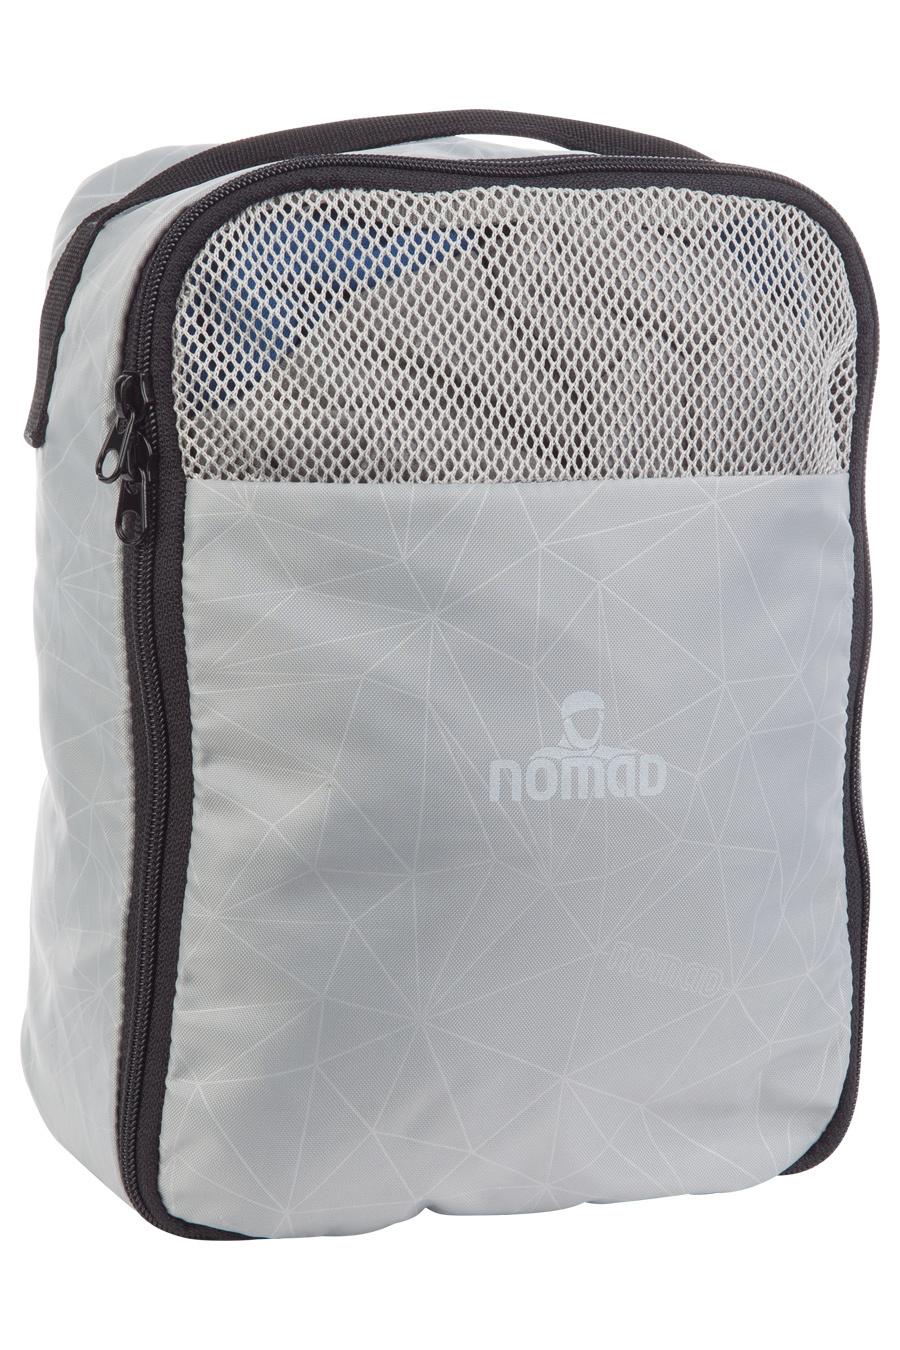 Nomad Box S _ Mist grey